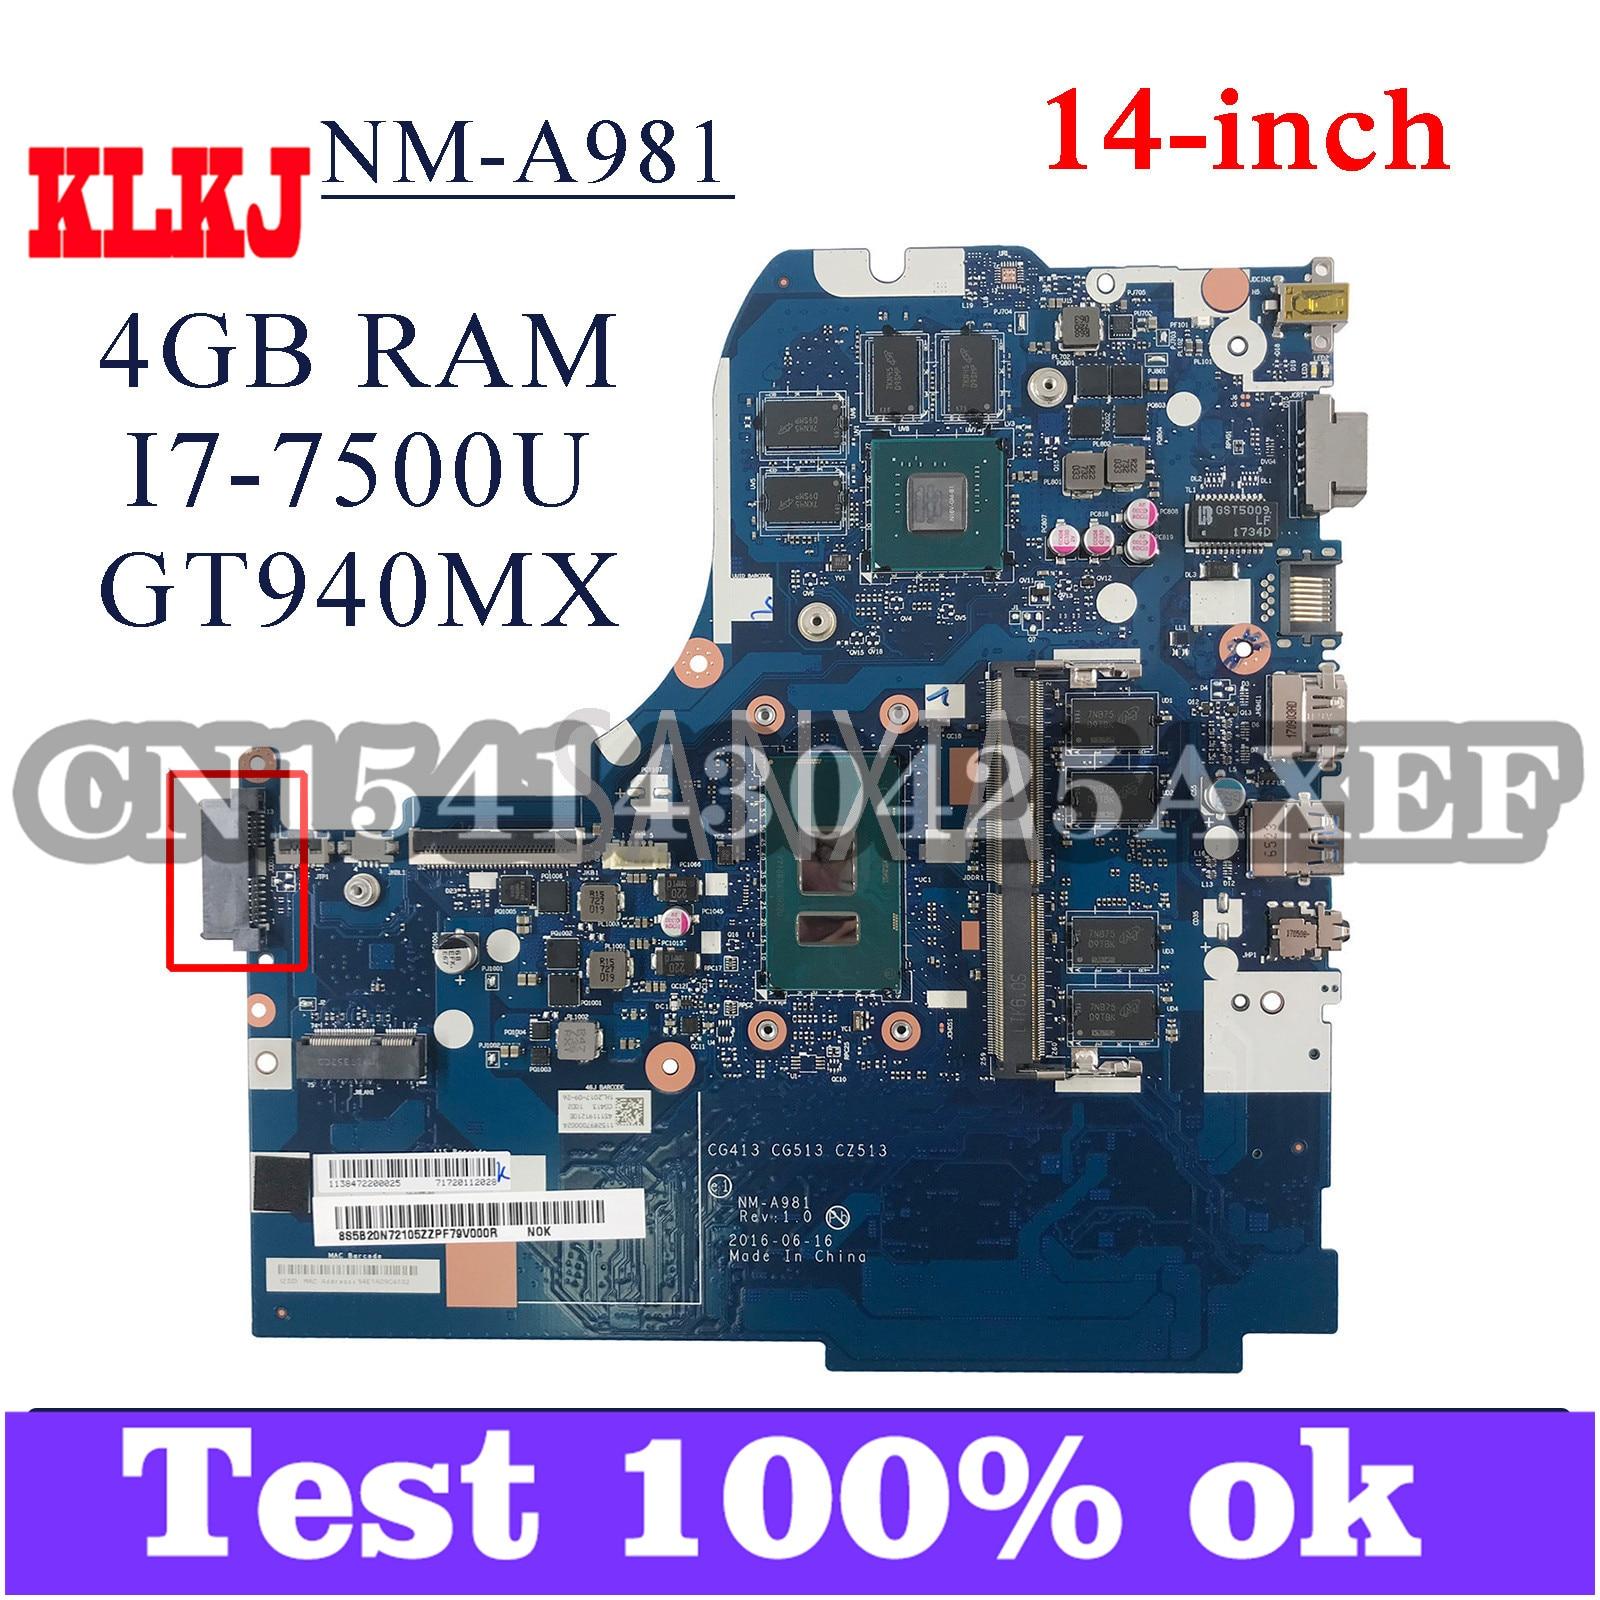 KLKJ NM-A981 اللوحة الأم لأجهزة الكمبيوتر المحمول لينوفو 310-14IKB (14 بوصة) اللوحة الرئيسية الأصلية 4GB-RAM I7-7500U GT940MX/920MX